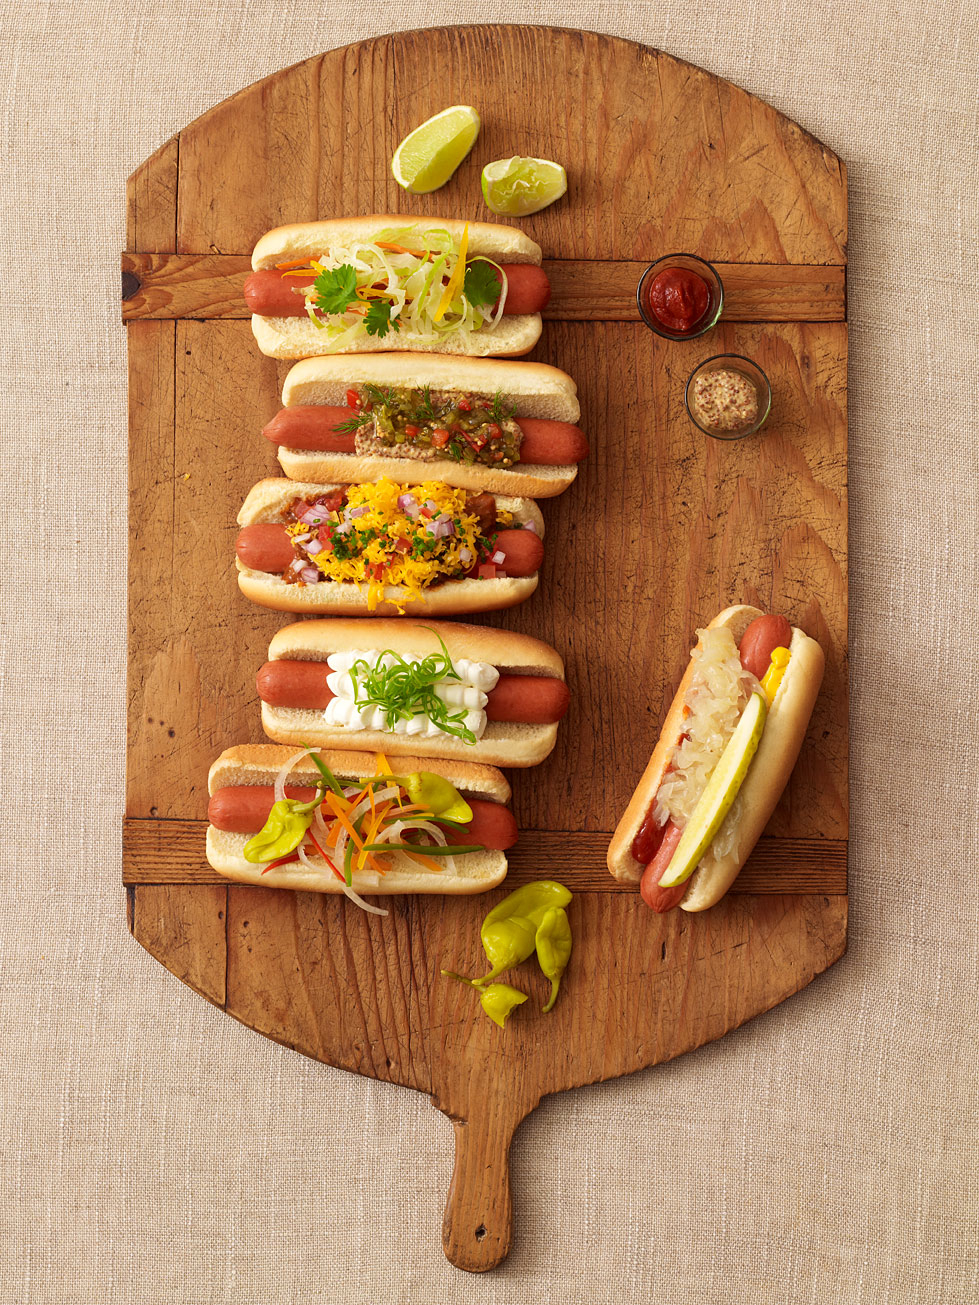 Hot-Dog-12111.jpg